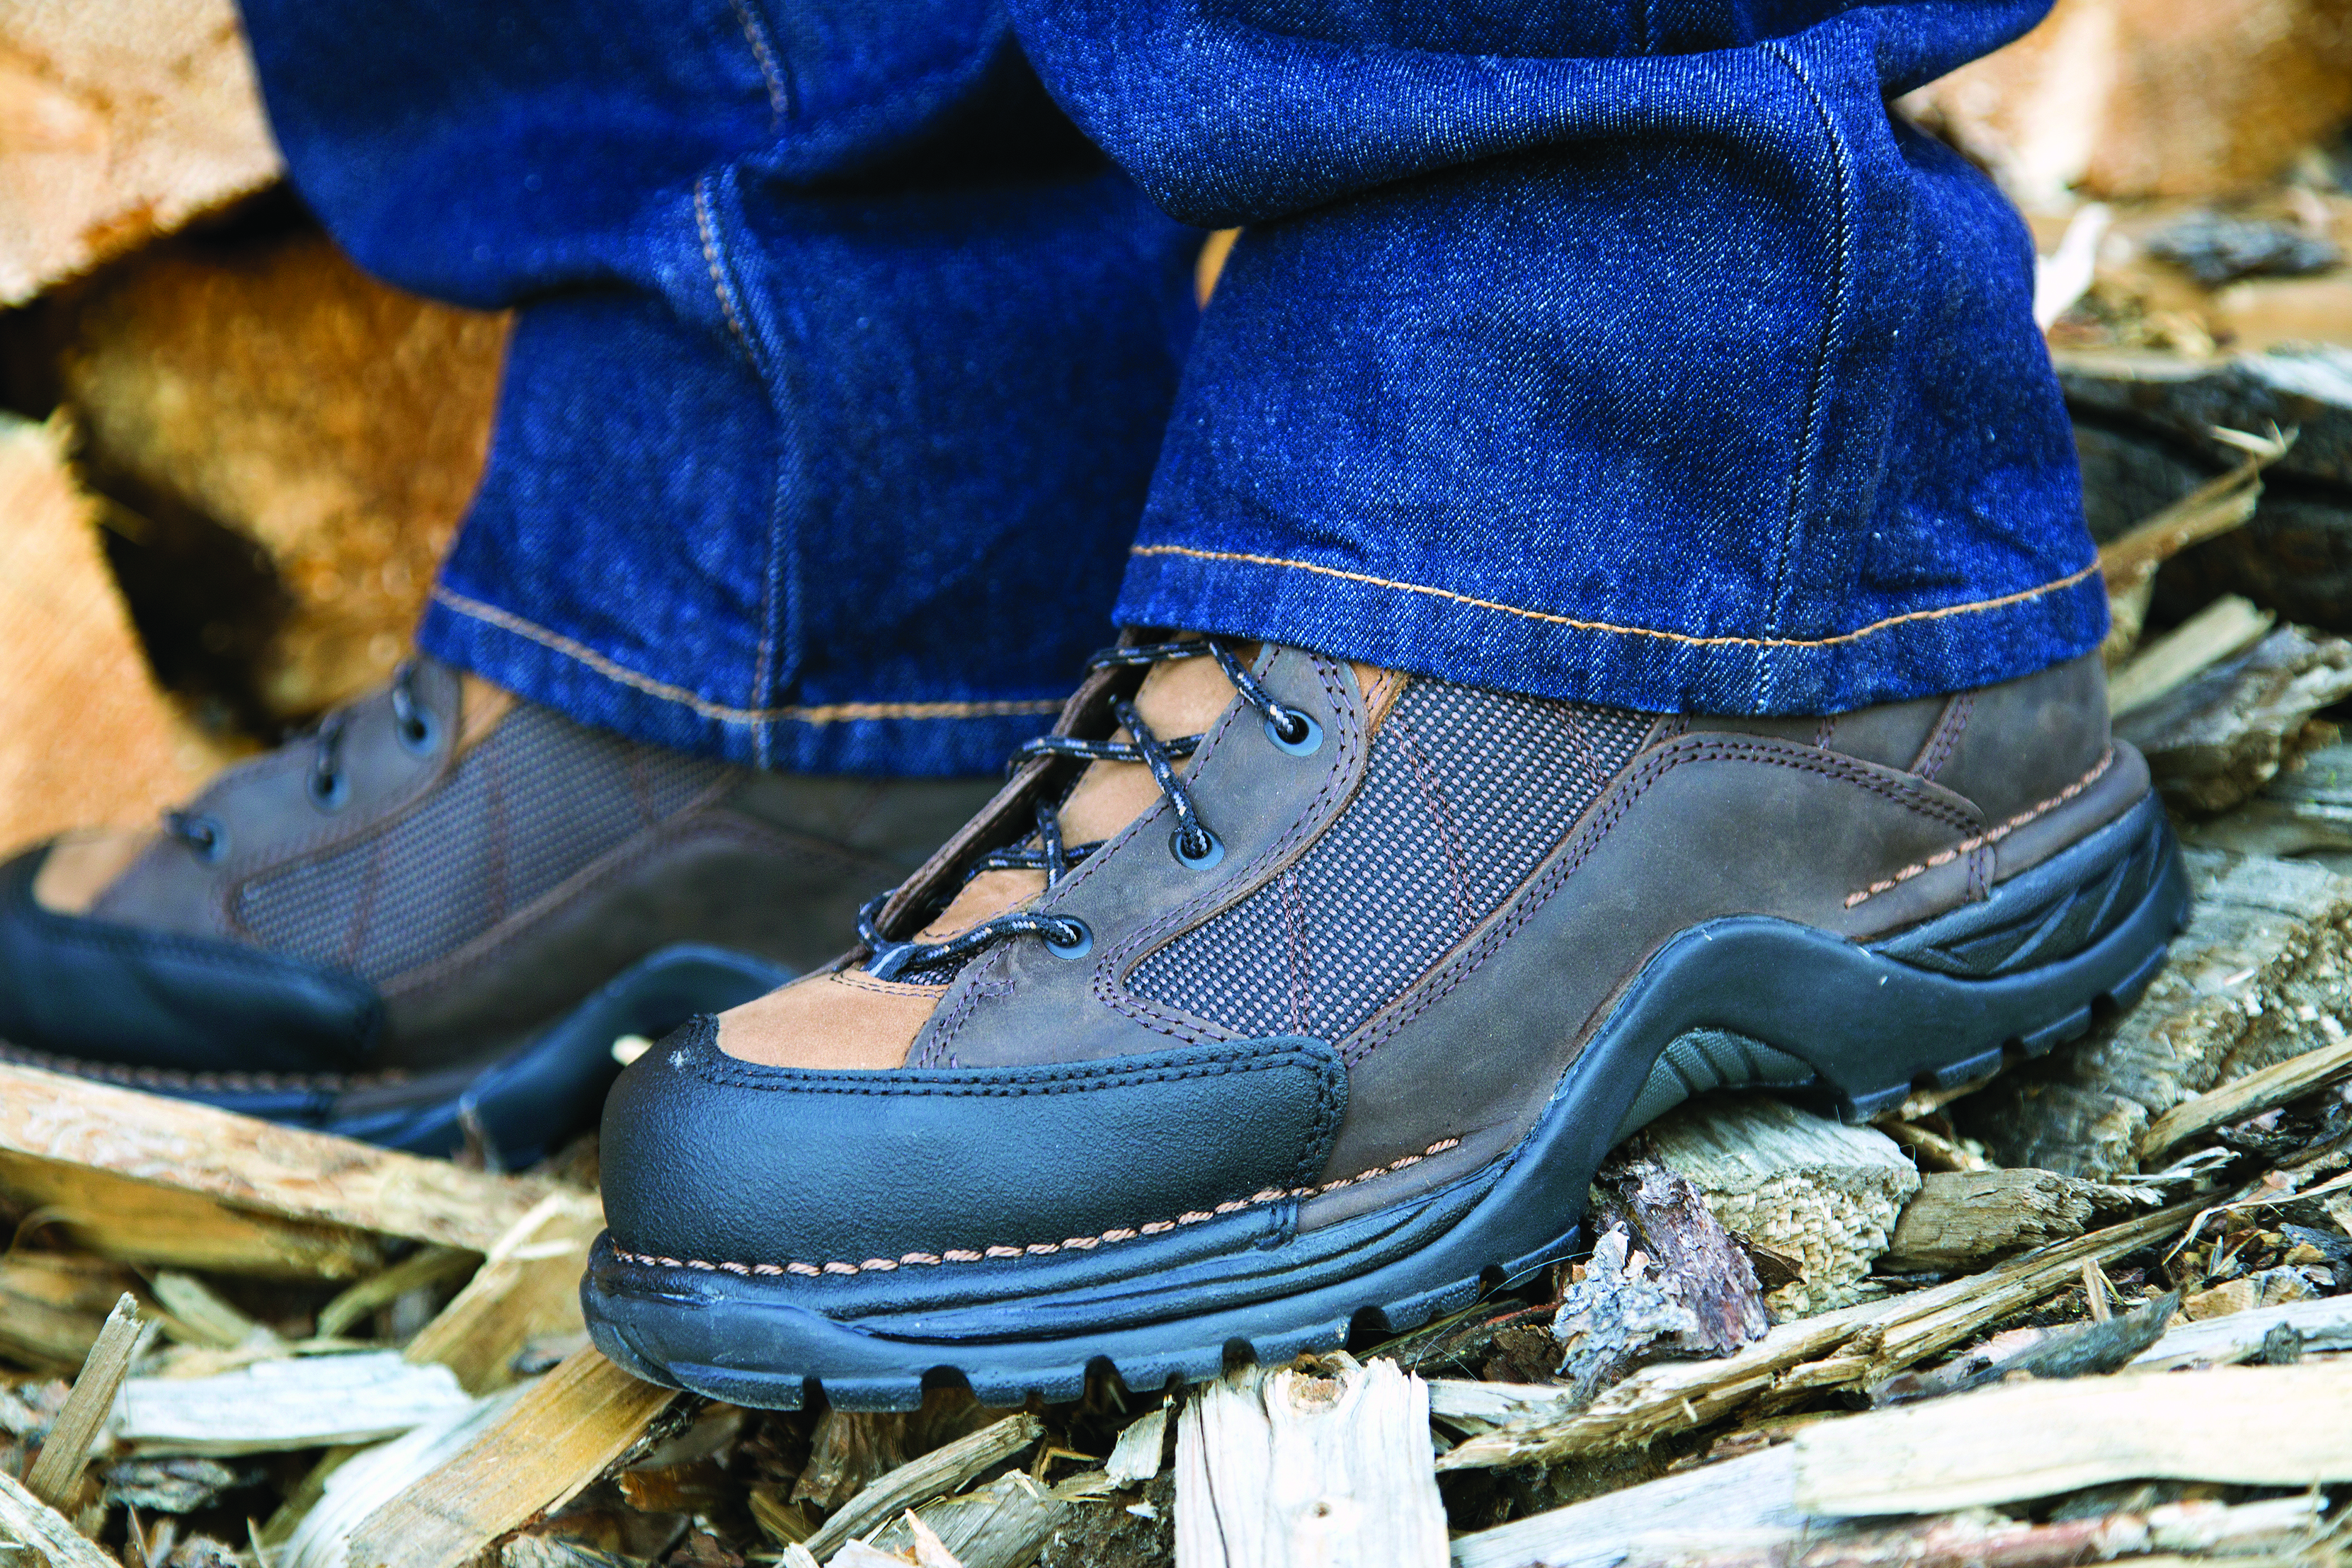 c2bae0b83a8 Murdoch's – Danner - Men's Radical™ 452 GTX® Hiking Boot